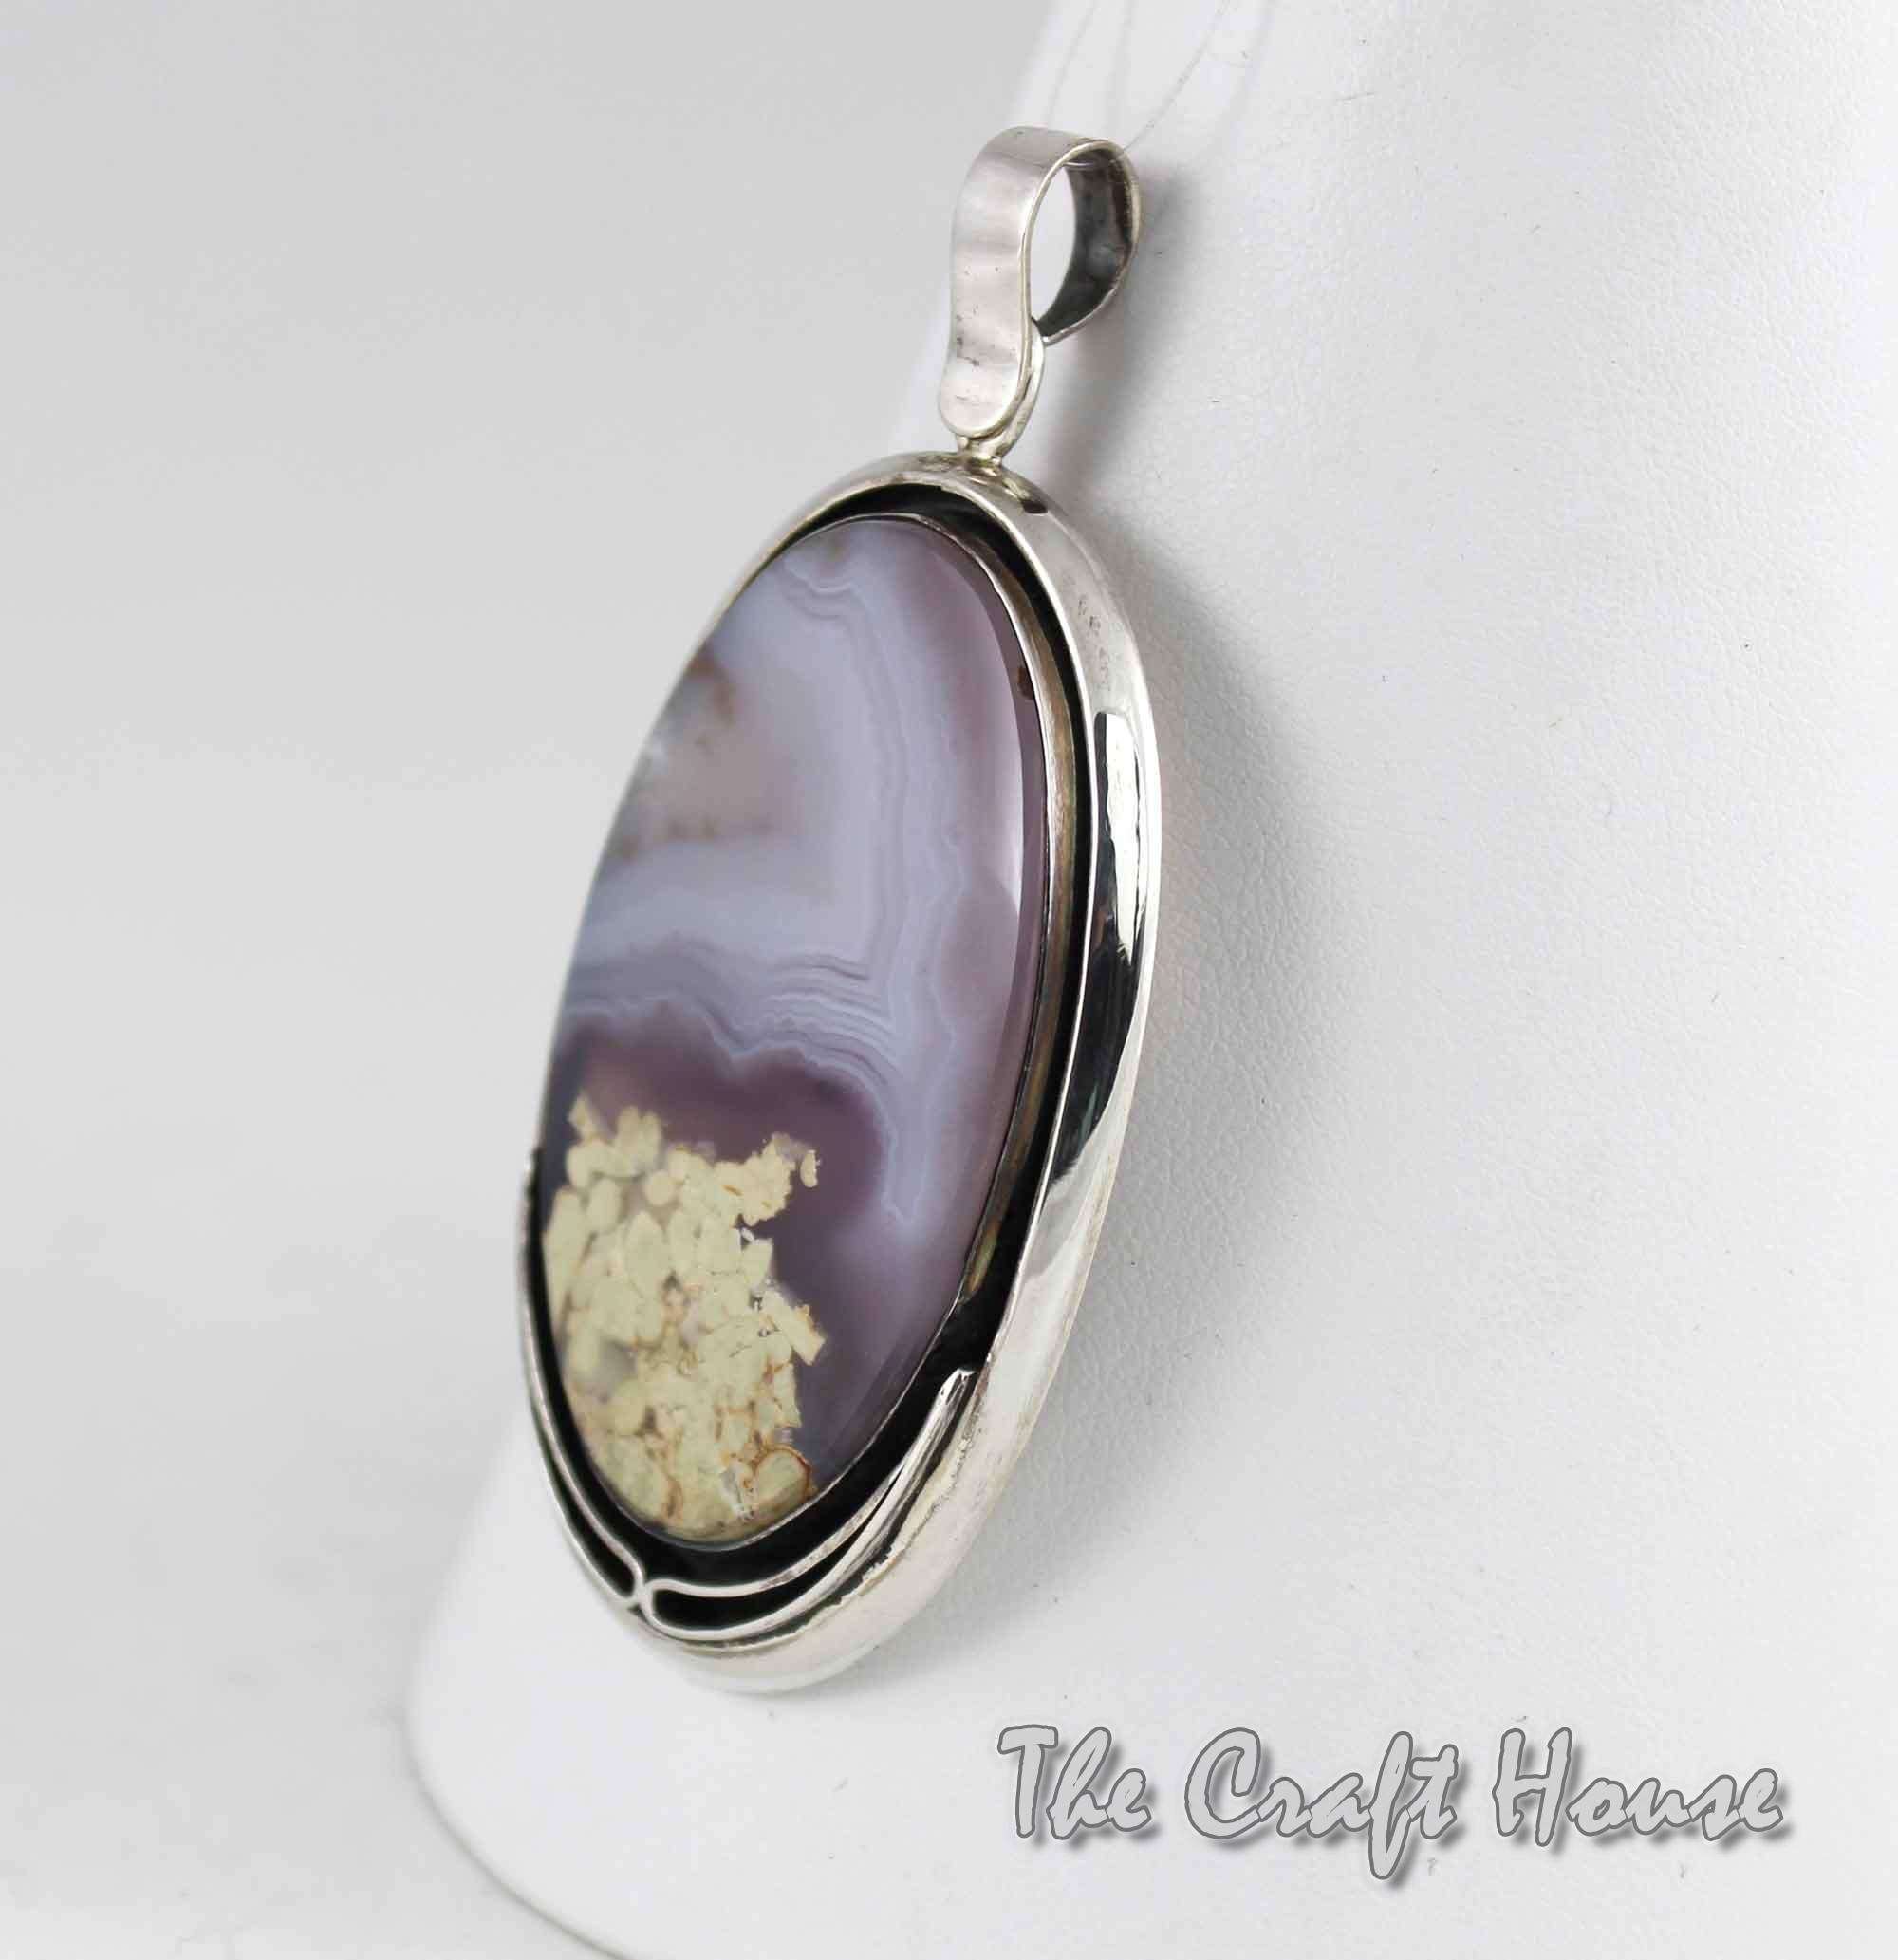 Сребърен медальон с Пейзажен ахат